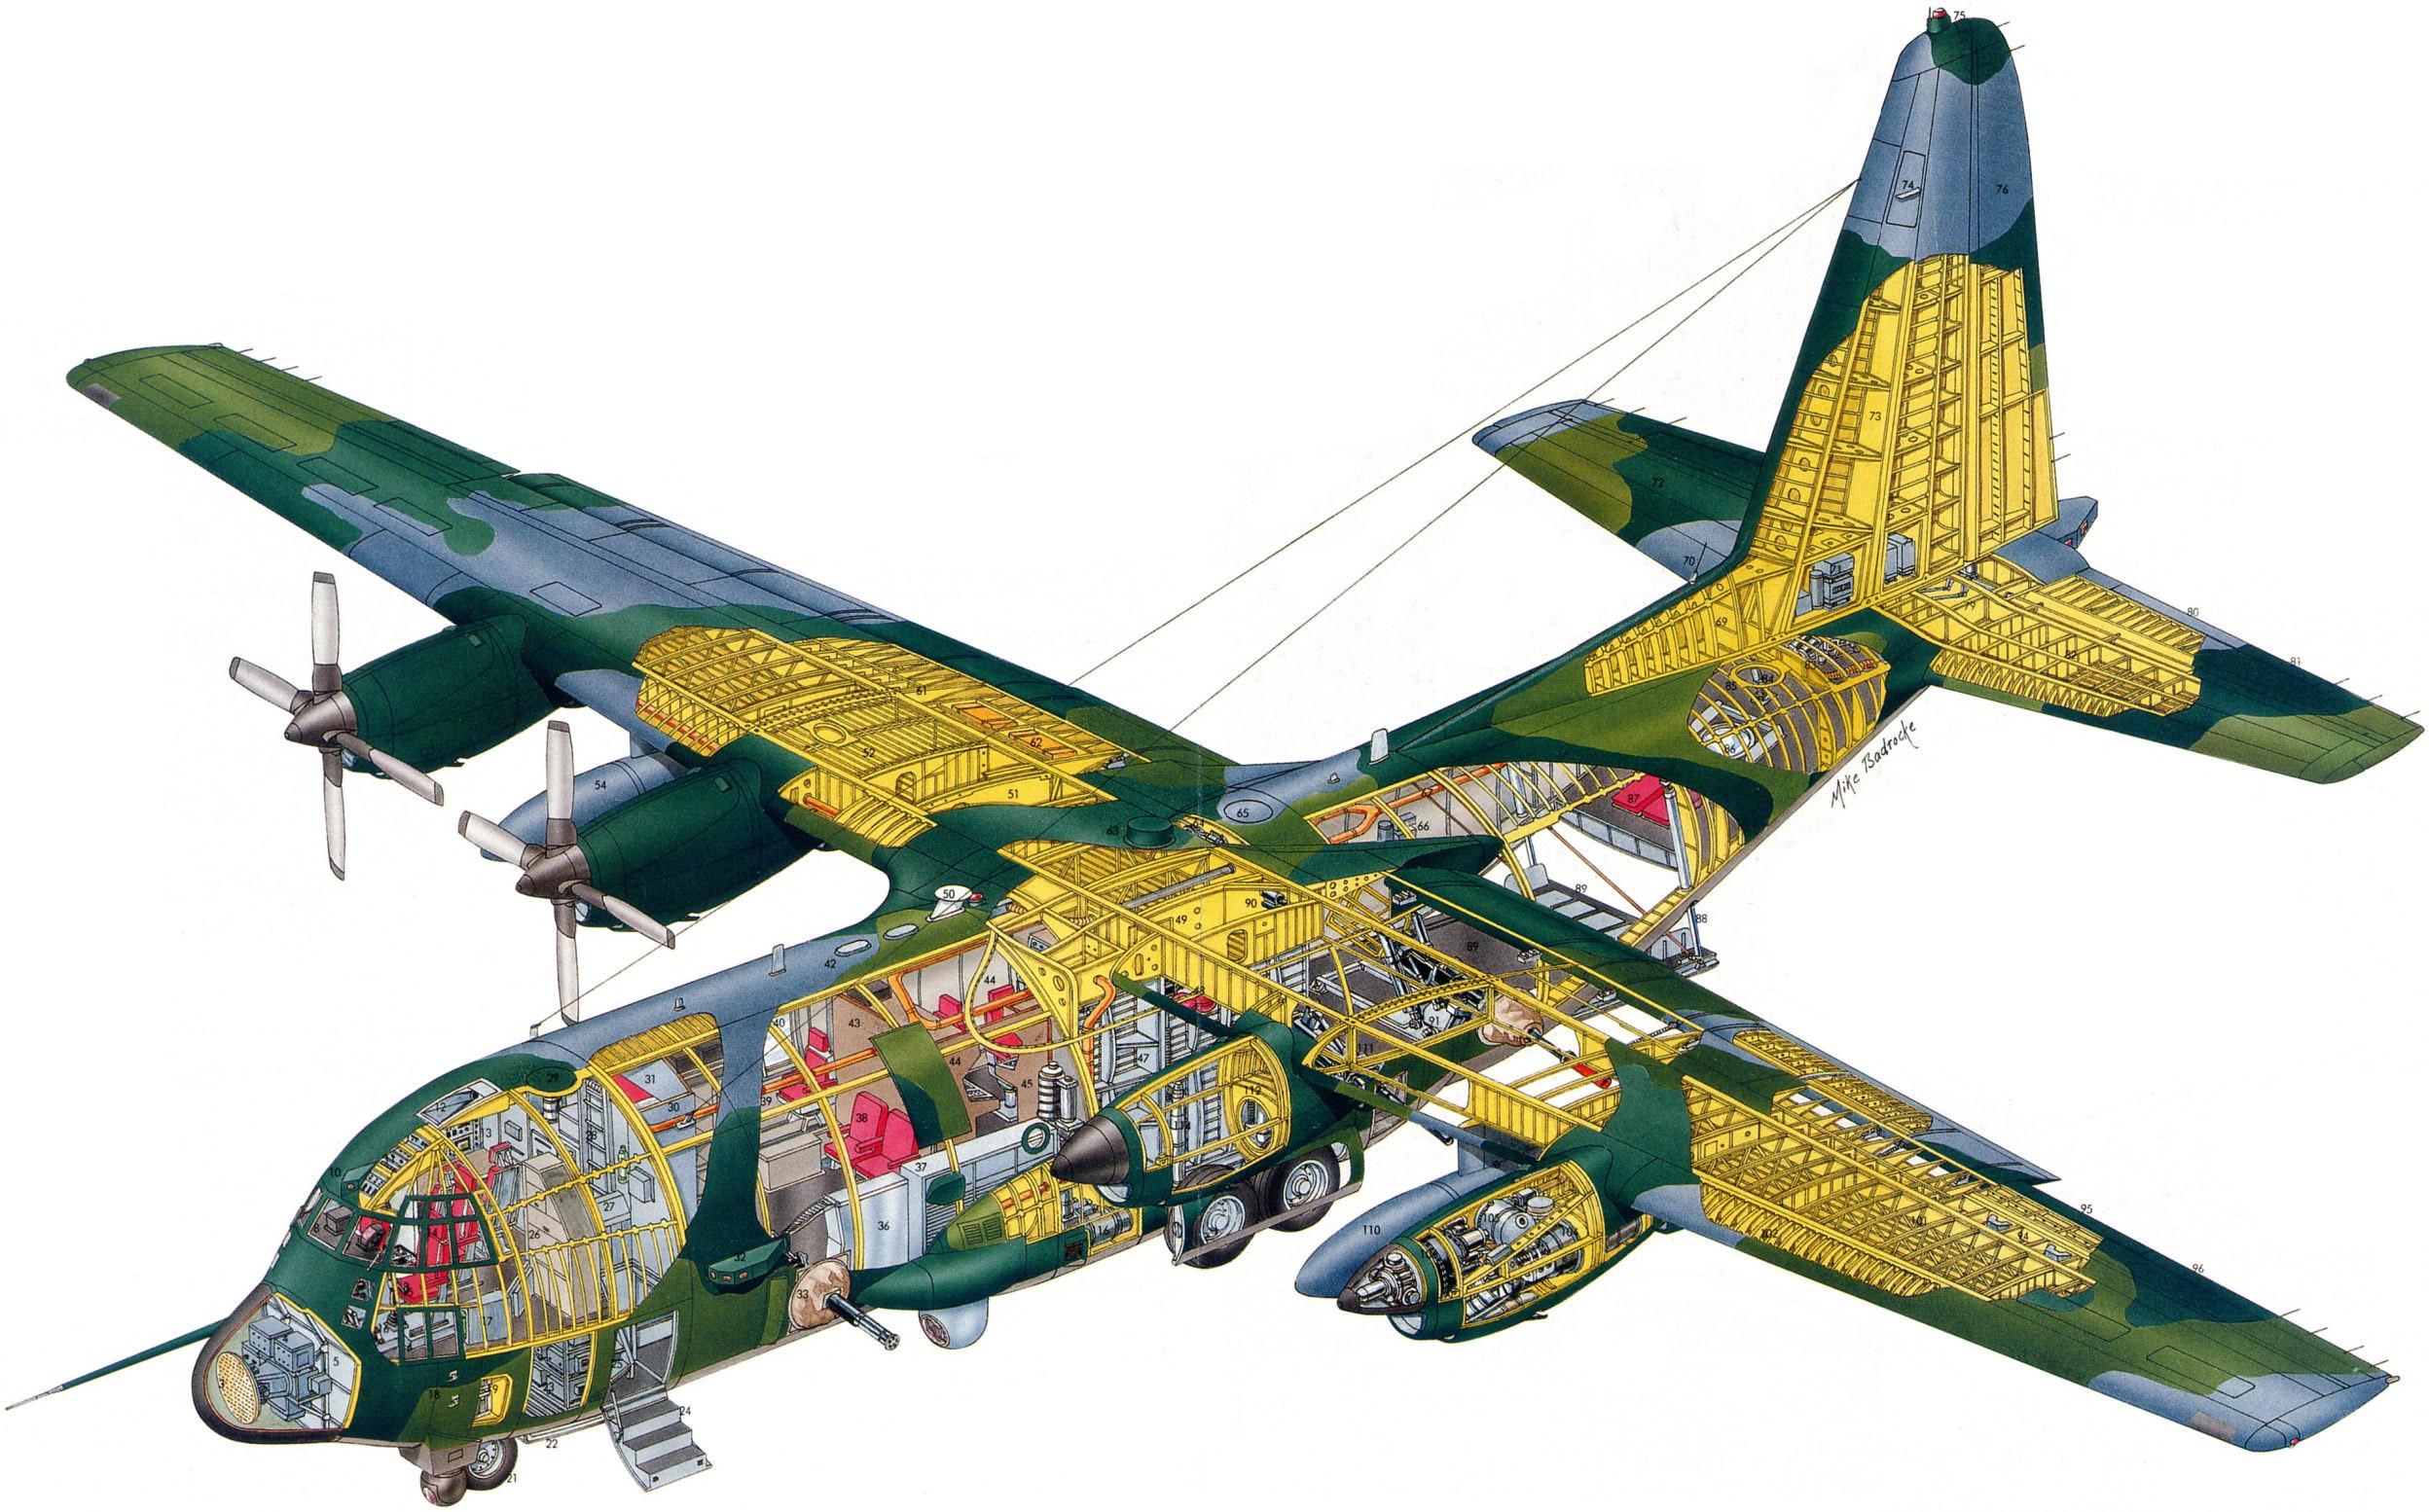 2496x1554 Lockheed C 130 Hercules Cutaway Drawing In High Quality